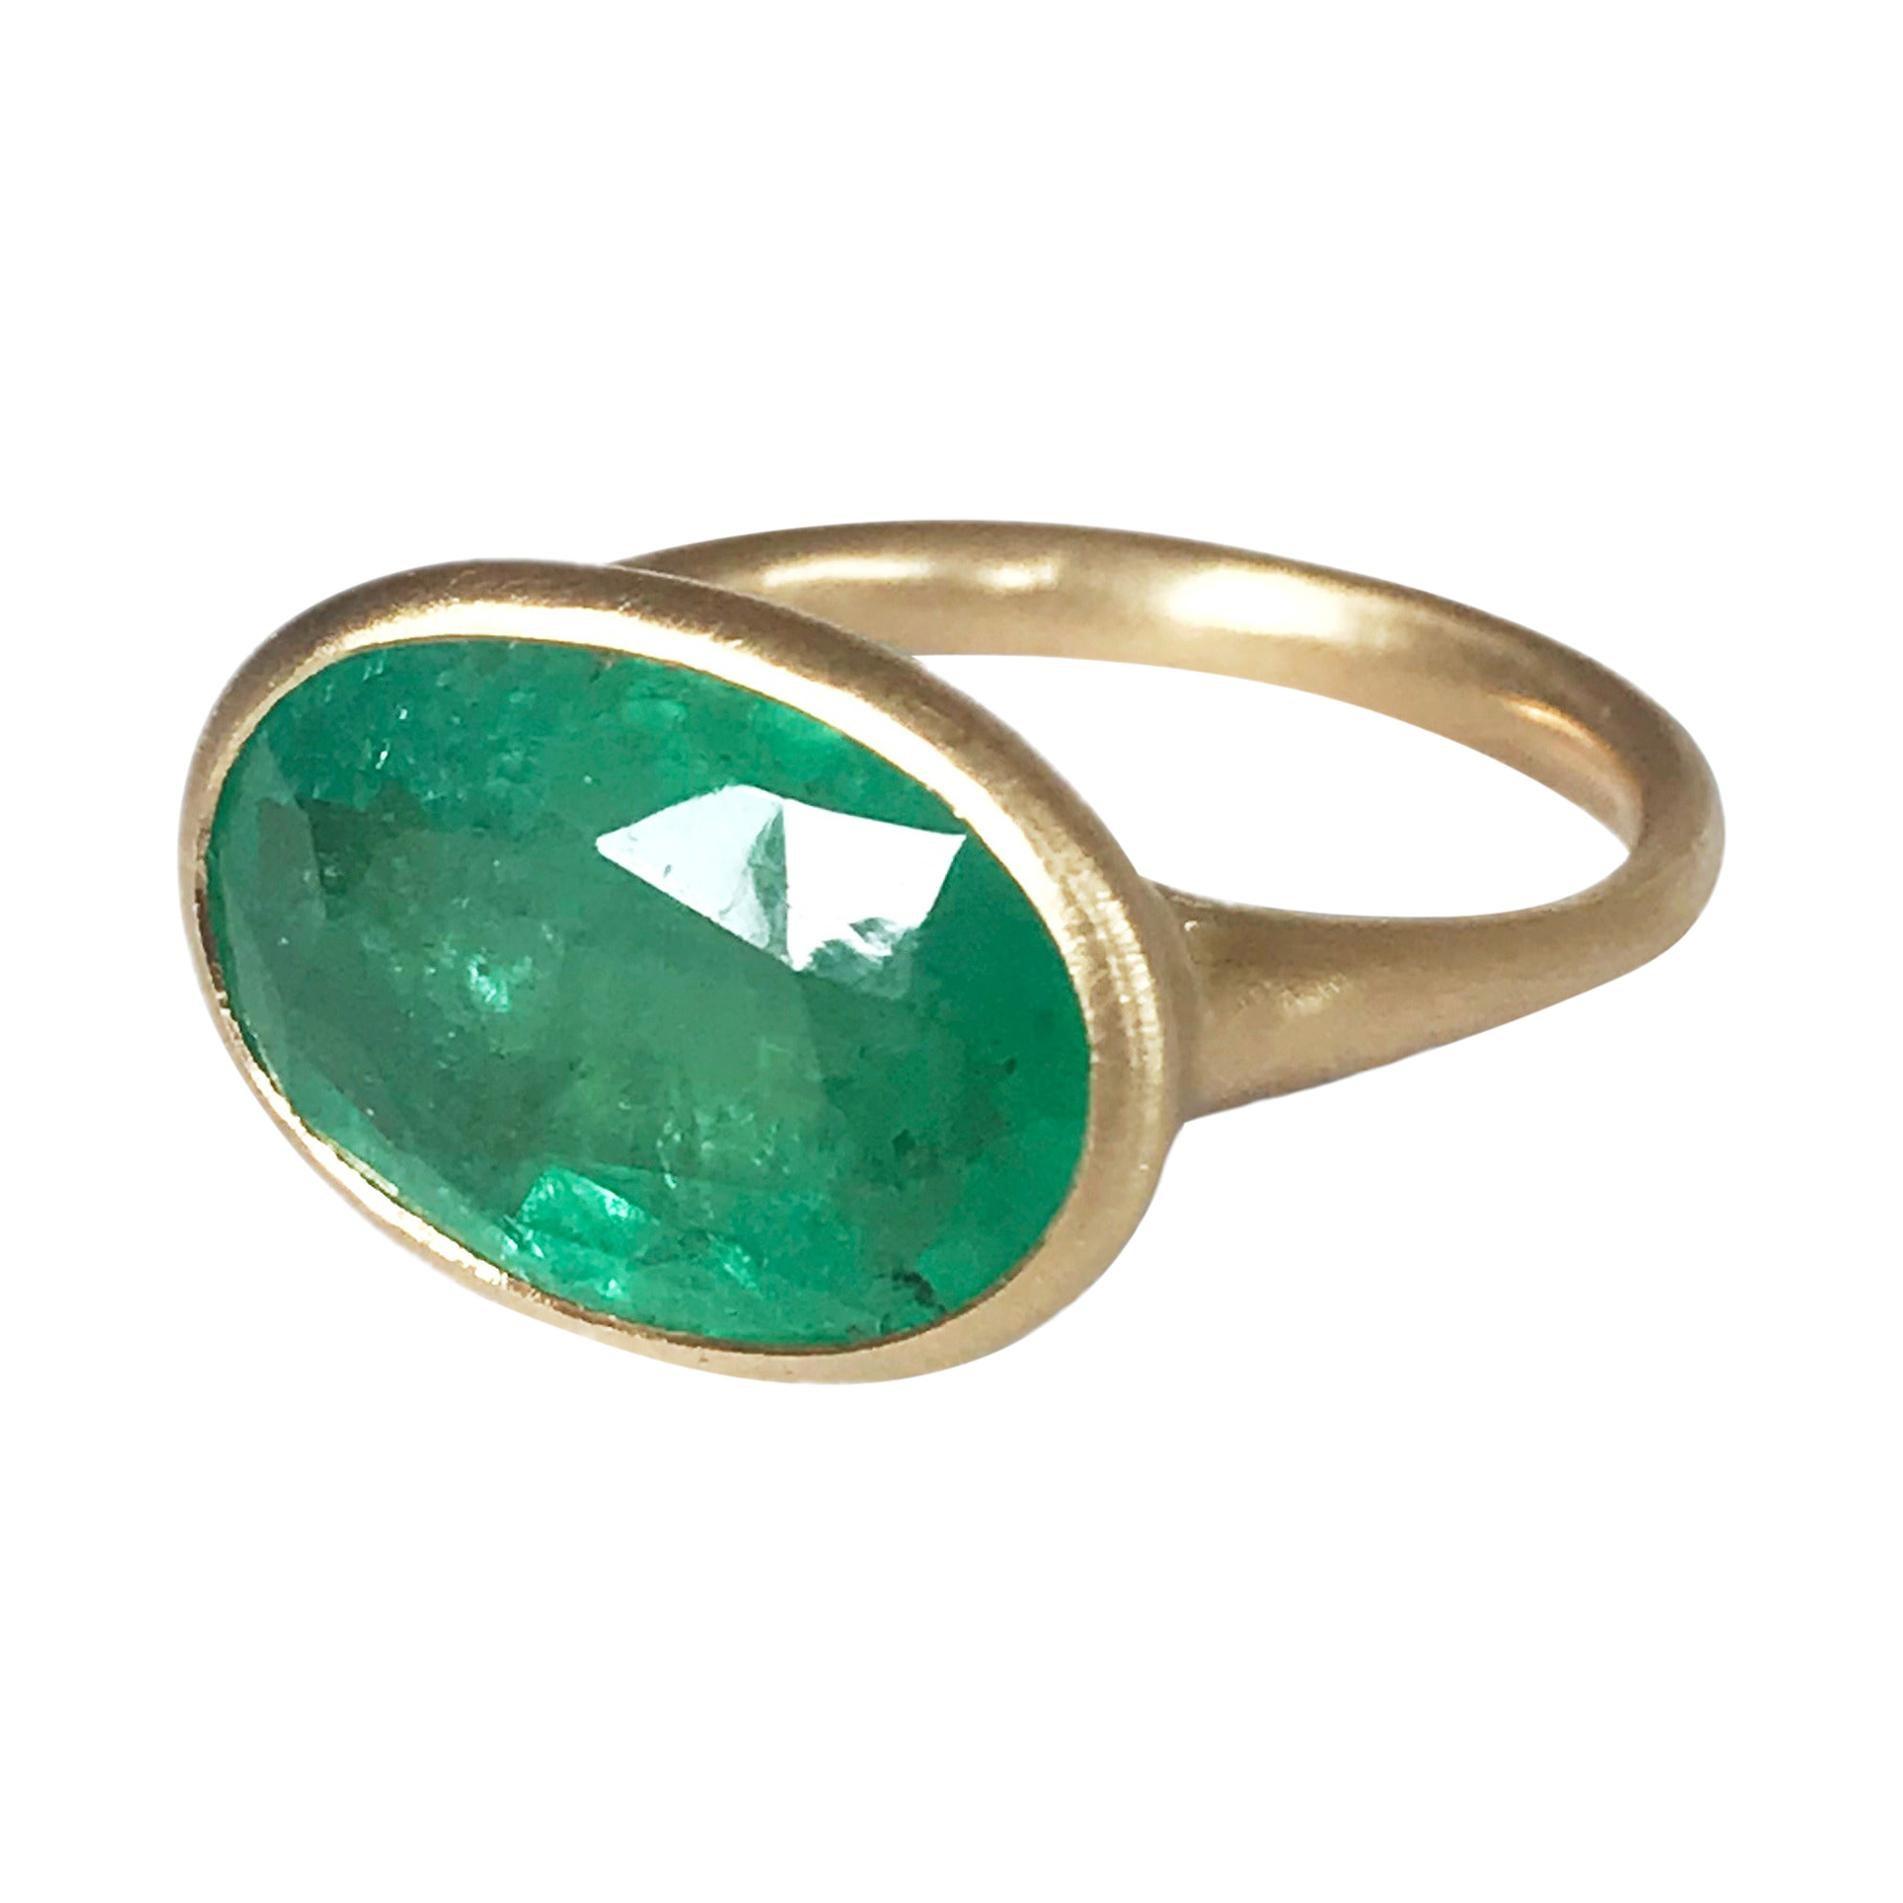 Dalben 5.5 Carat Oval Emerald Yellow Gold Ring